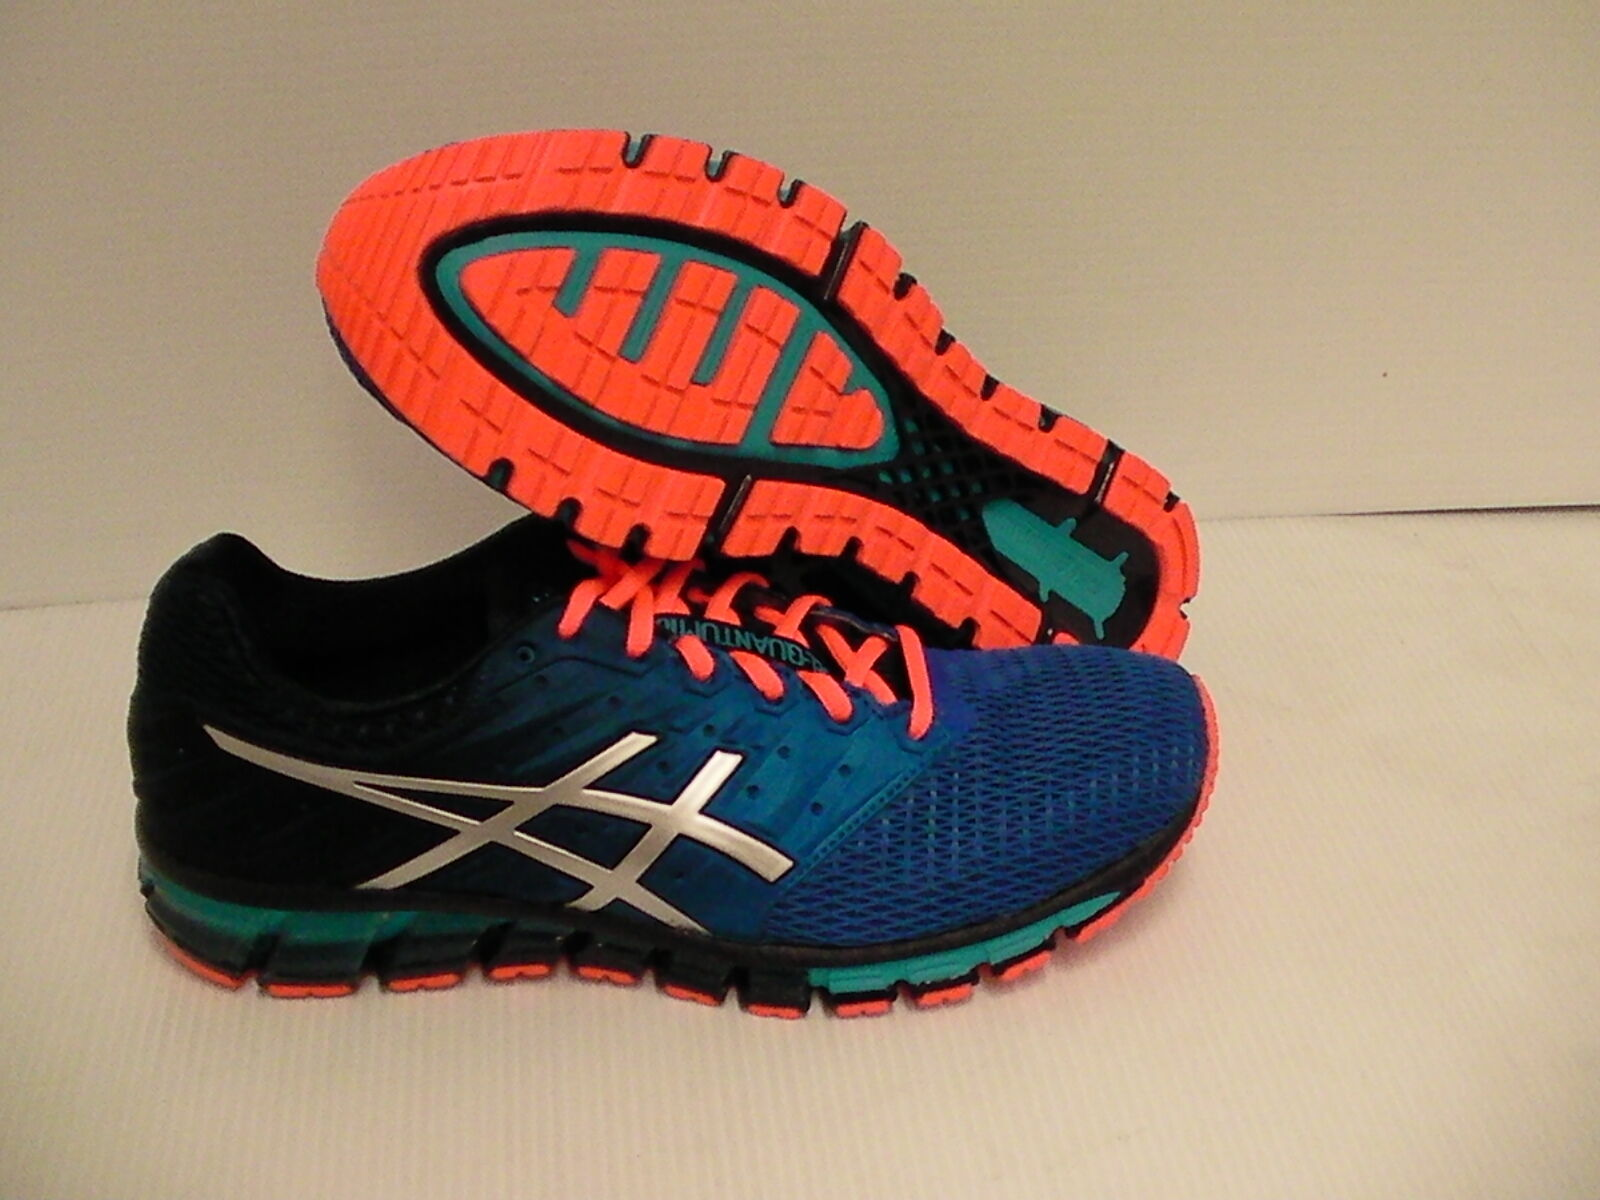 Asics gel quantum 180 dark 2 dark 180 navy Uomo running shoes size 11 us d9caf0